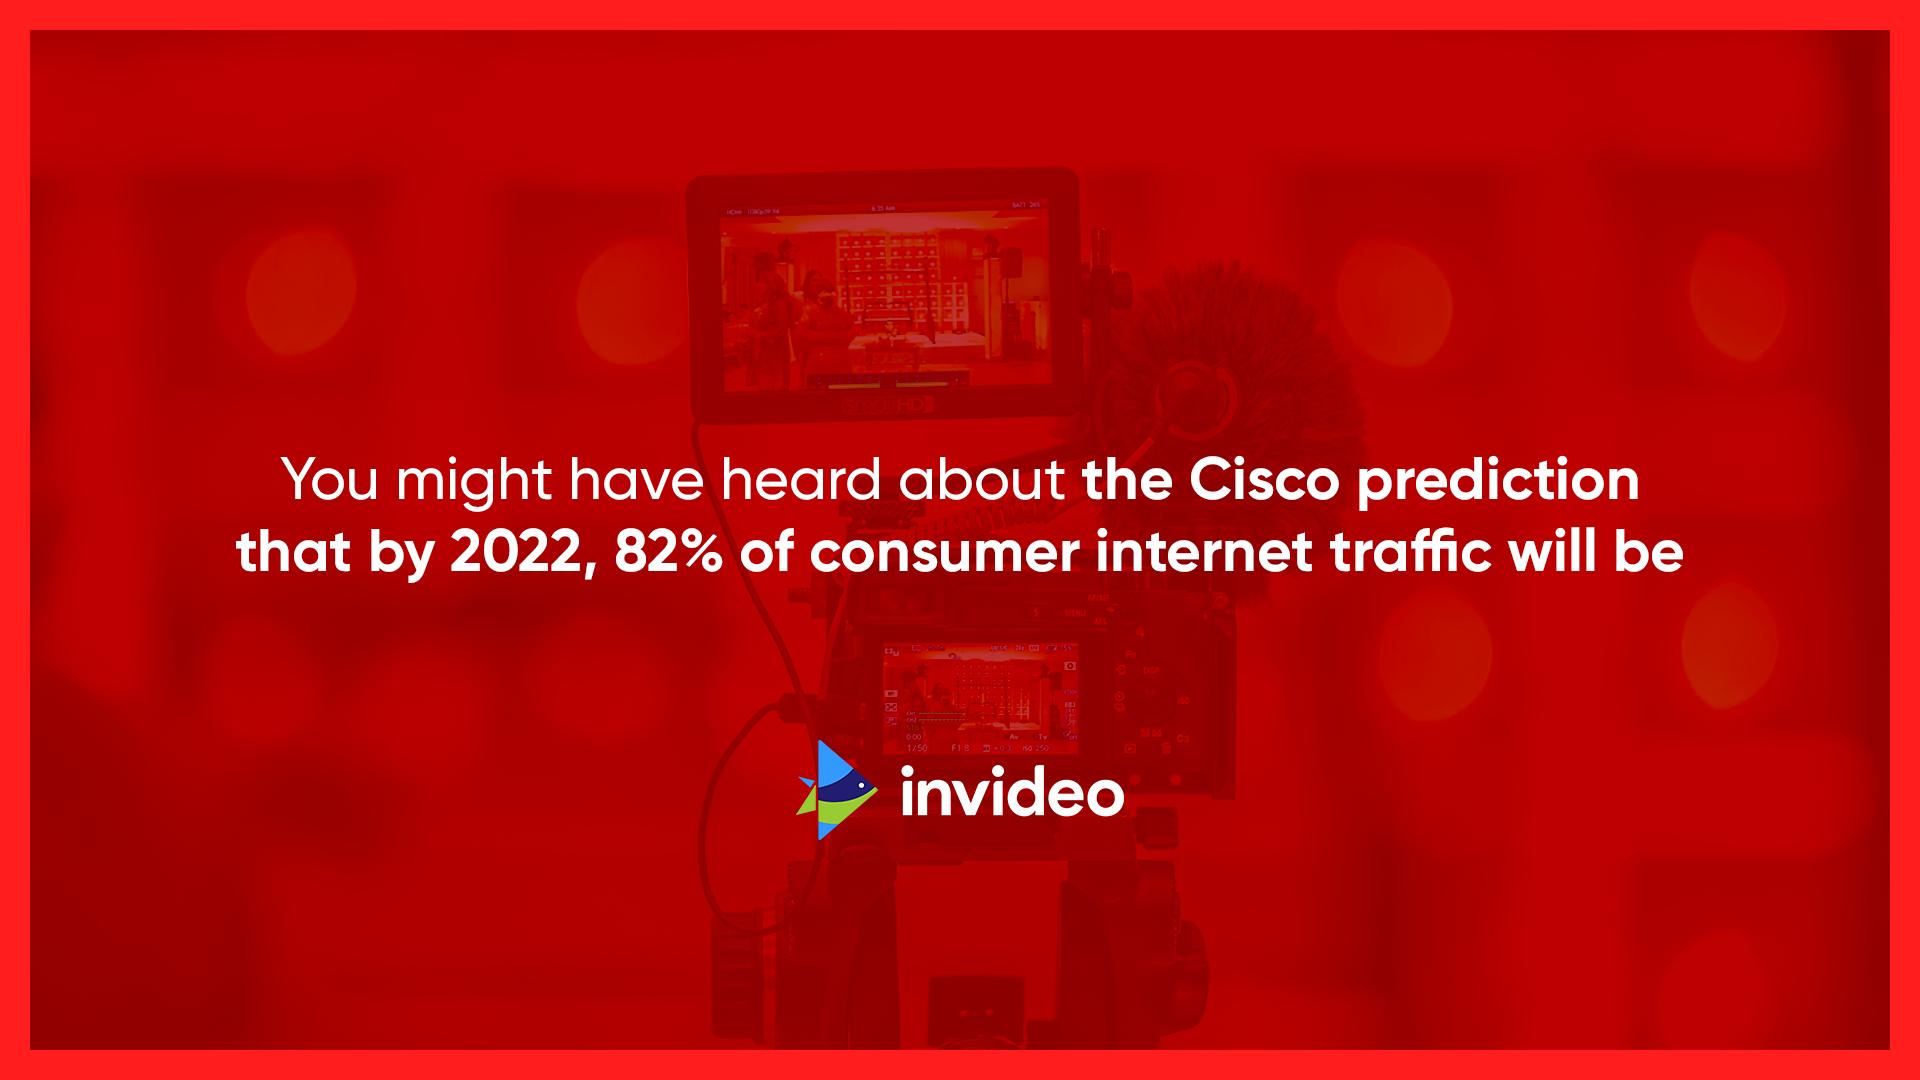 Cisco Prediction